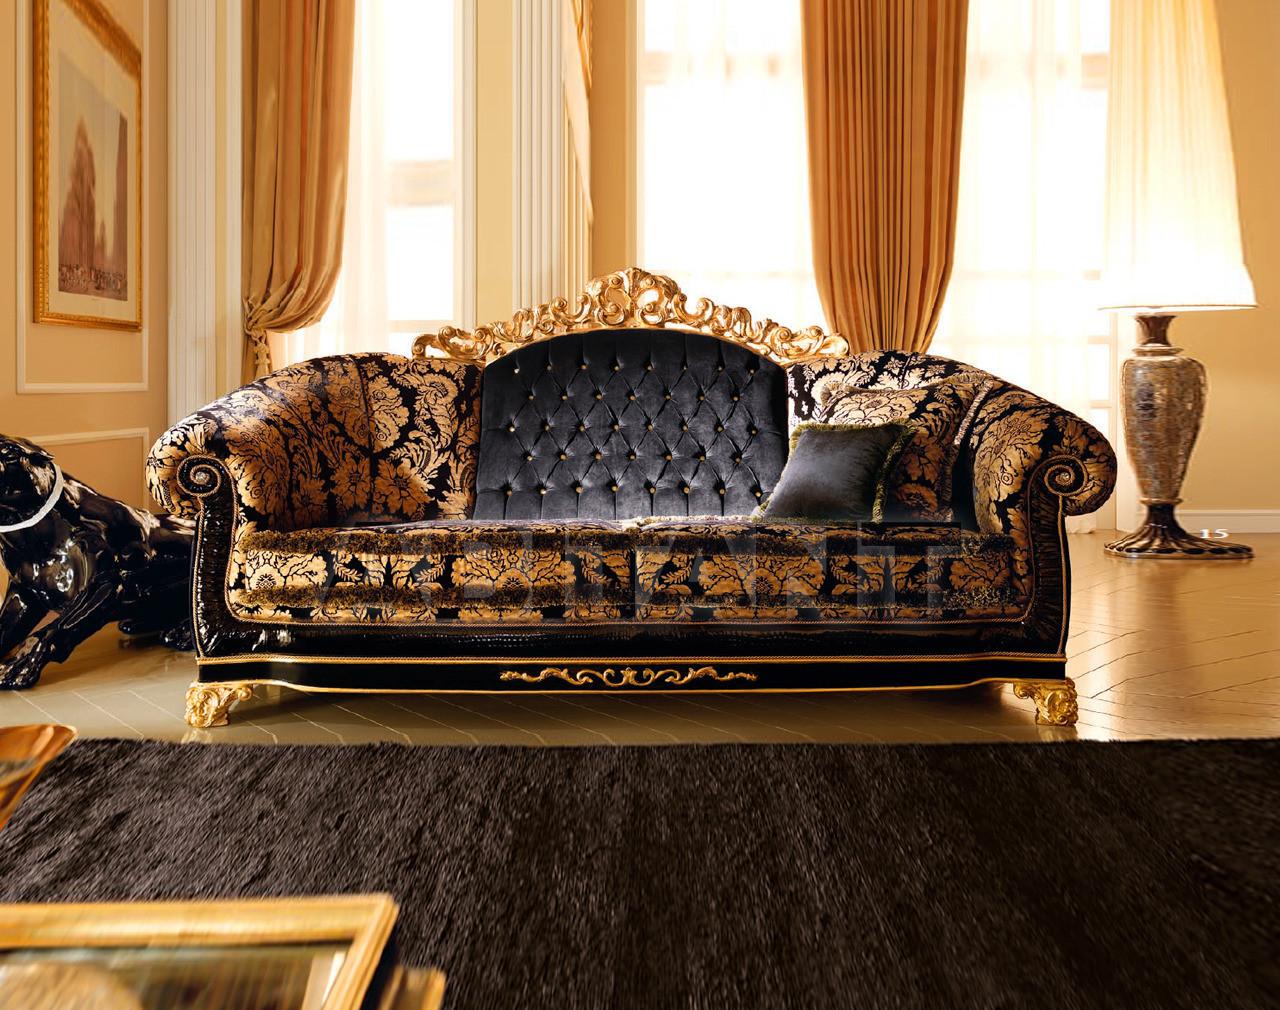 Купить Диван Classic Stile/Arredo&sofa Lord Lord  3 SEAT SOFA